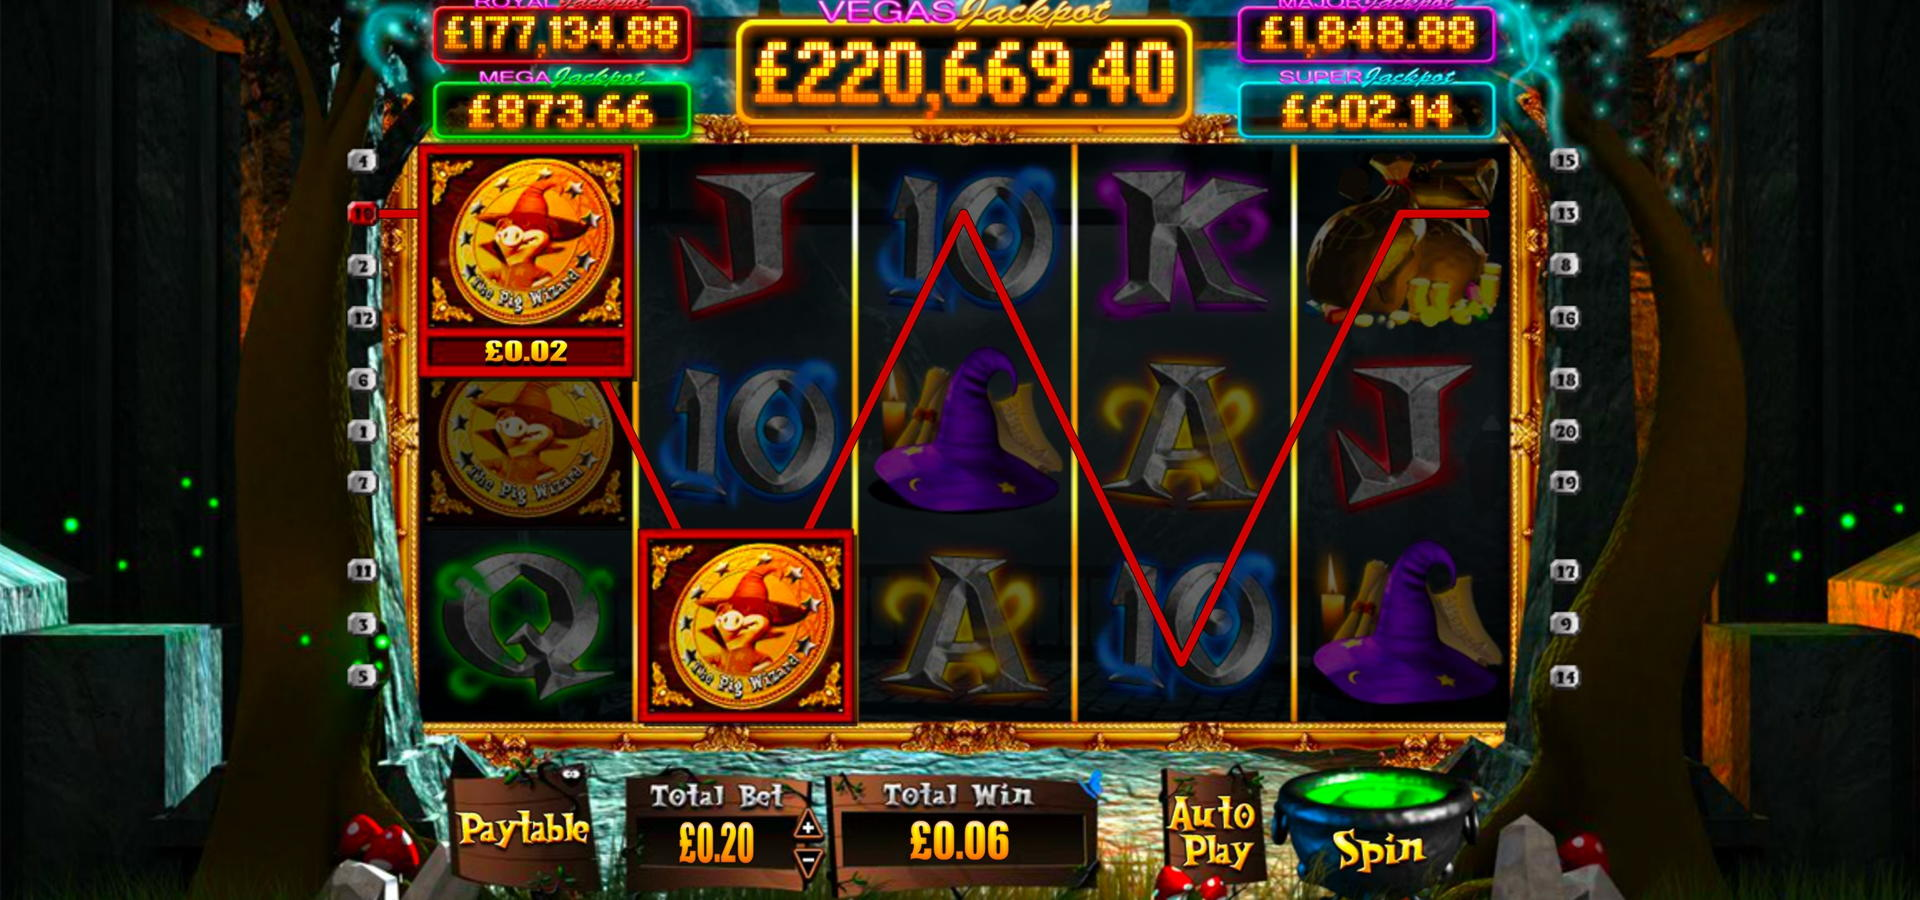 Euro 4140 Bez depozytu Casino Bonus w Mayan Fortune